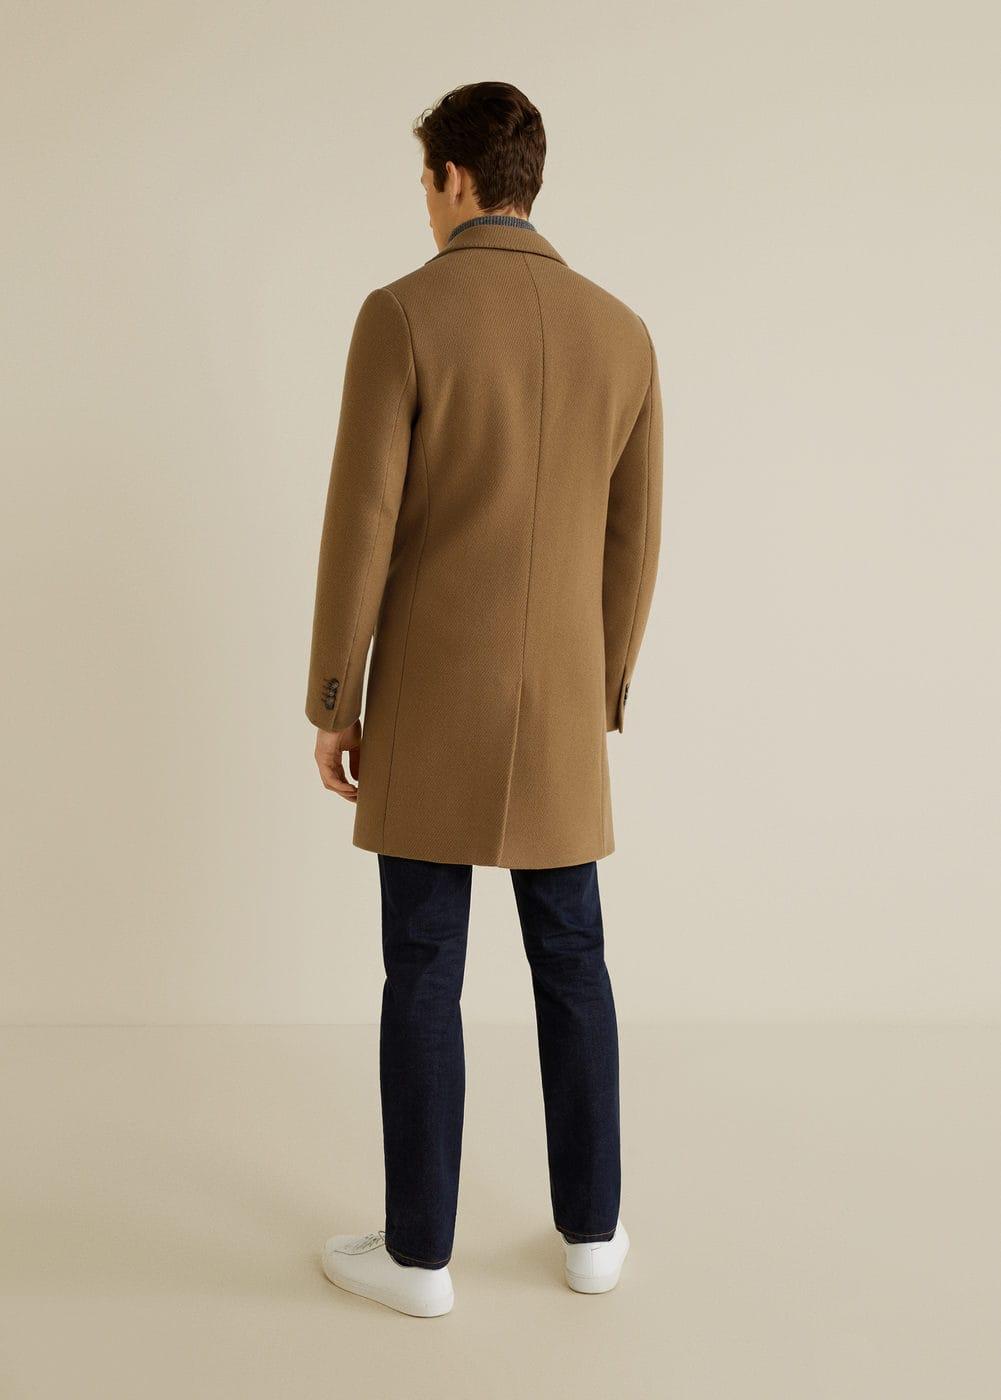 Mango - Structured virgin wool coat - 3